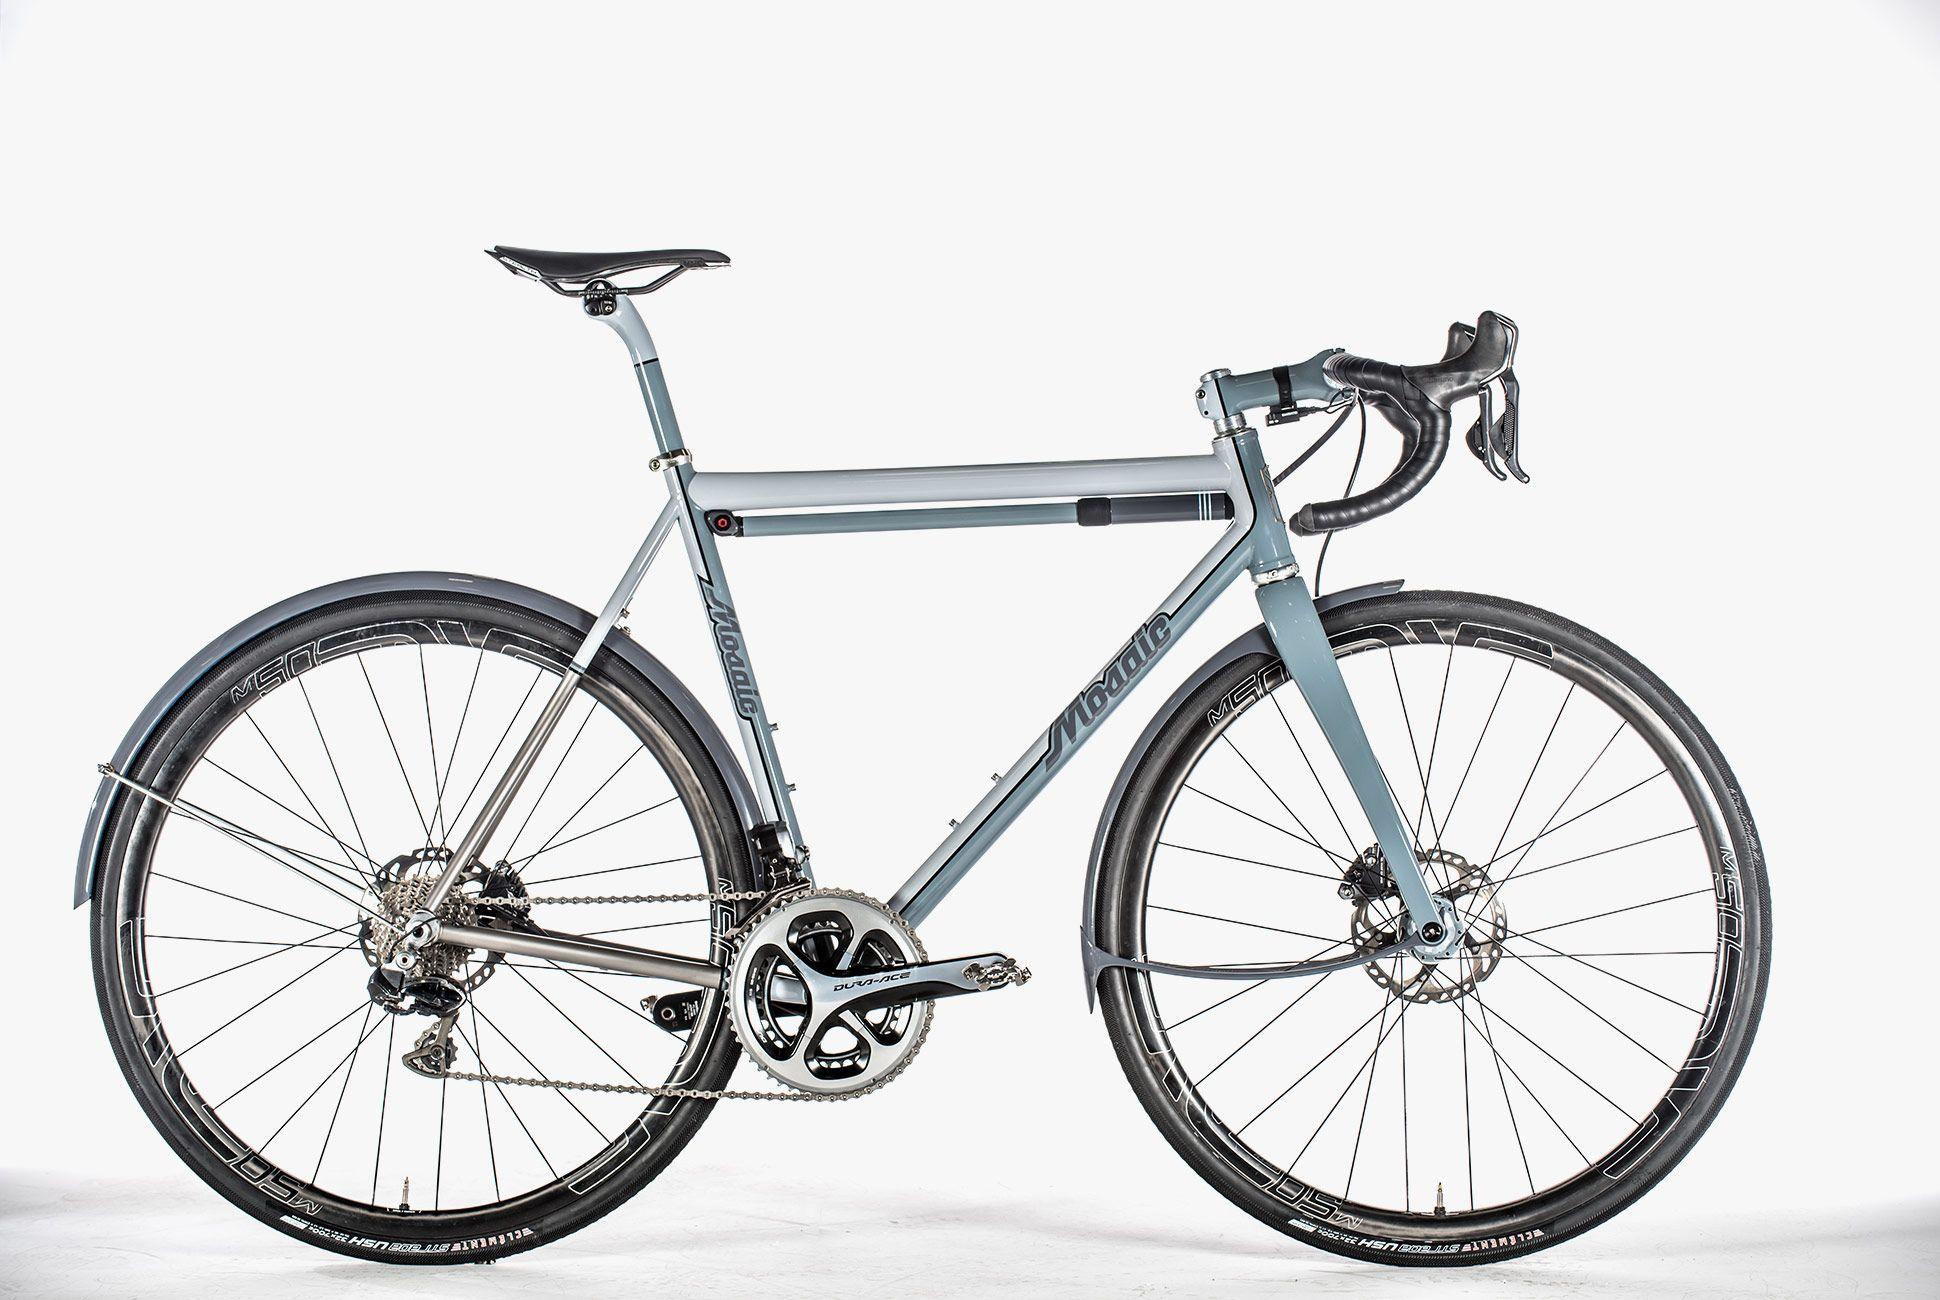 Bikes-From-NAHBS-Gear-Patrol-17